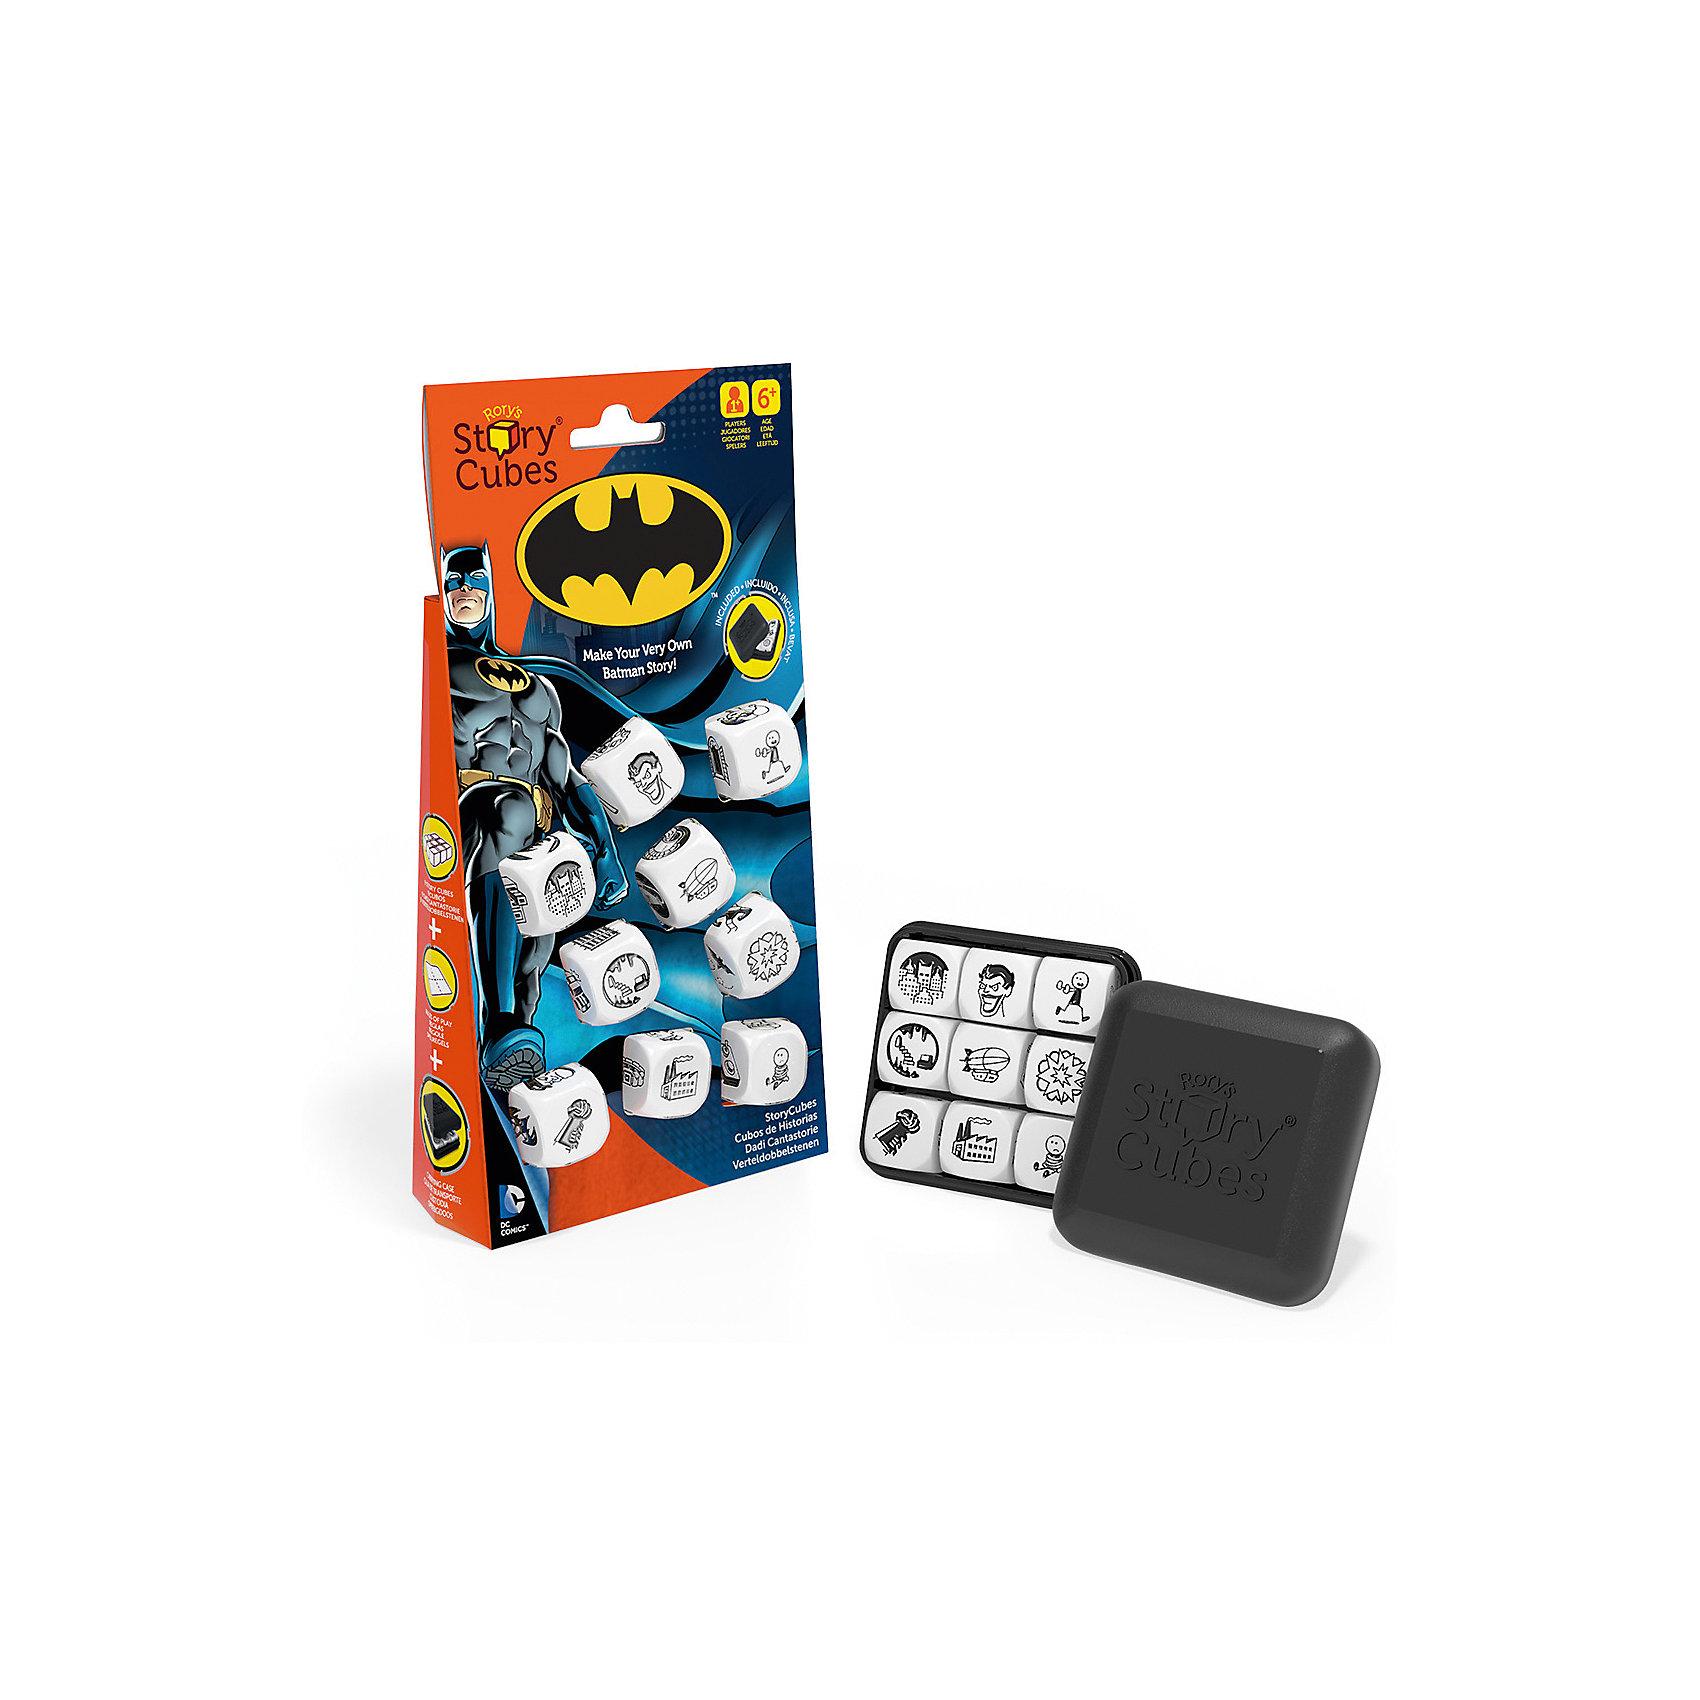 Кубики Историй Бэтмен, Rory's Story Cubes